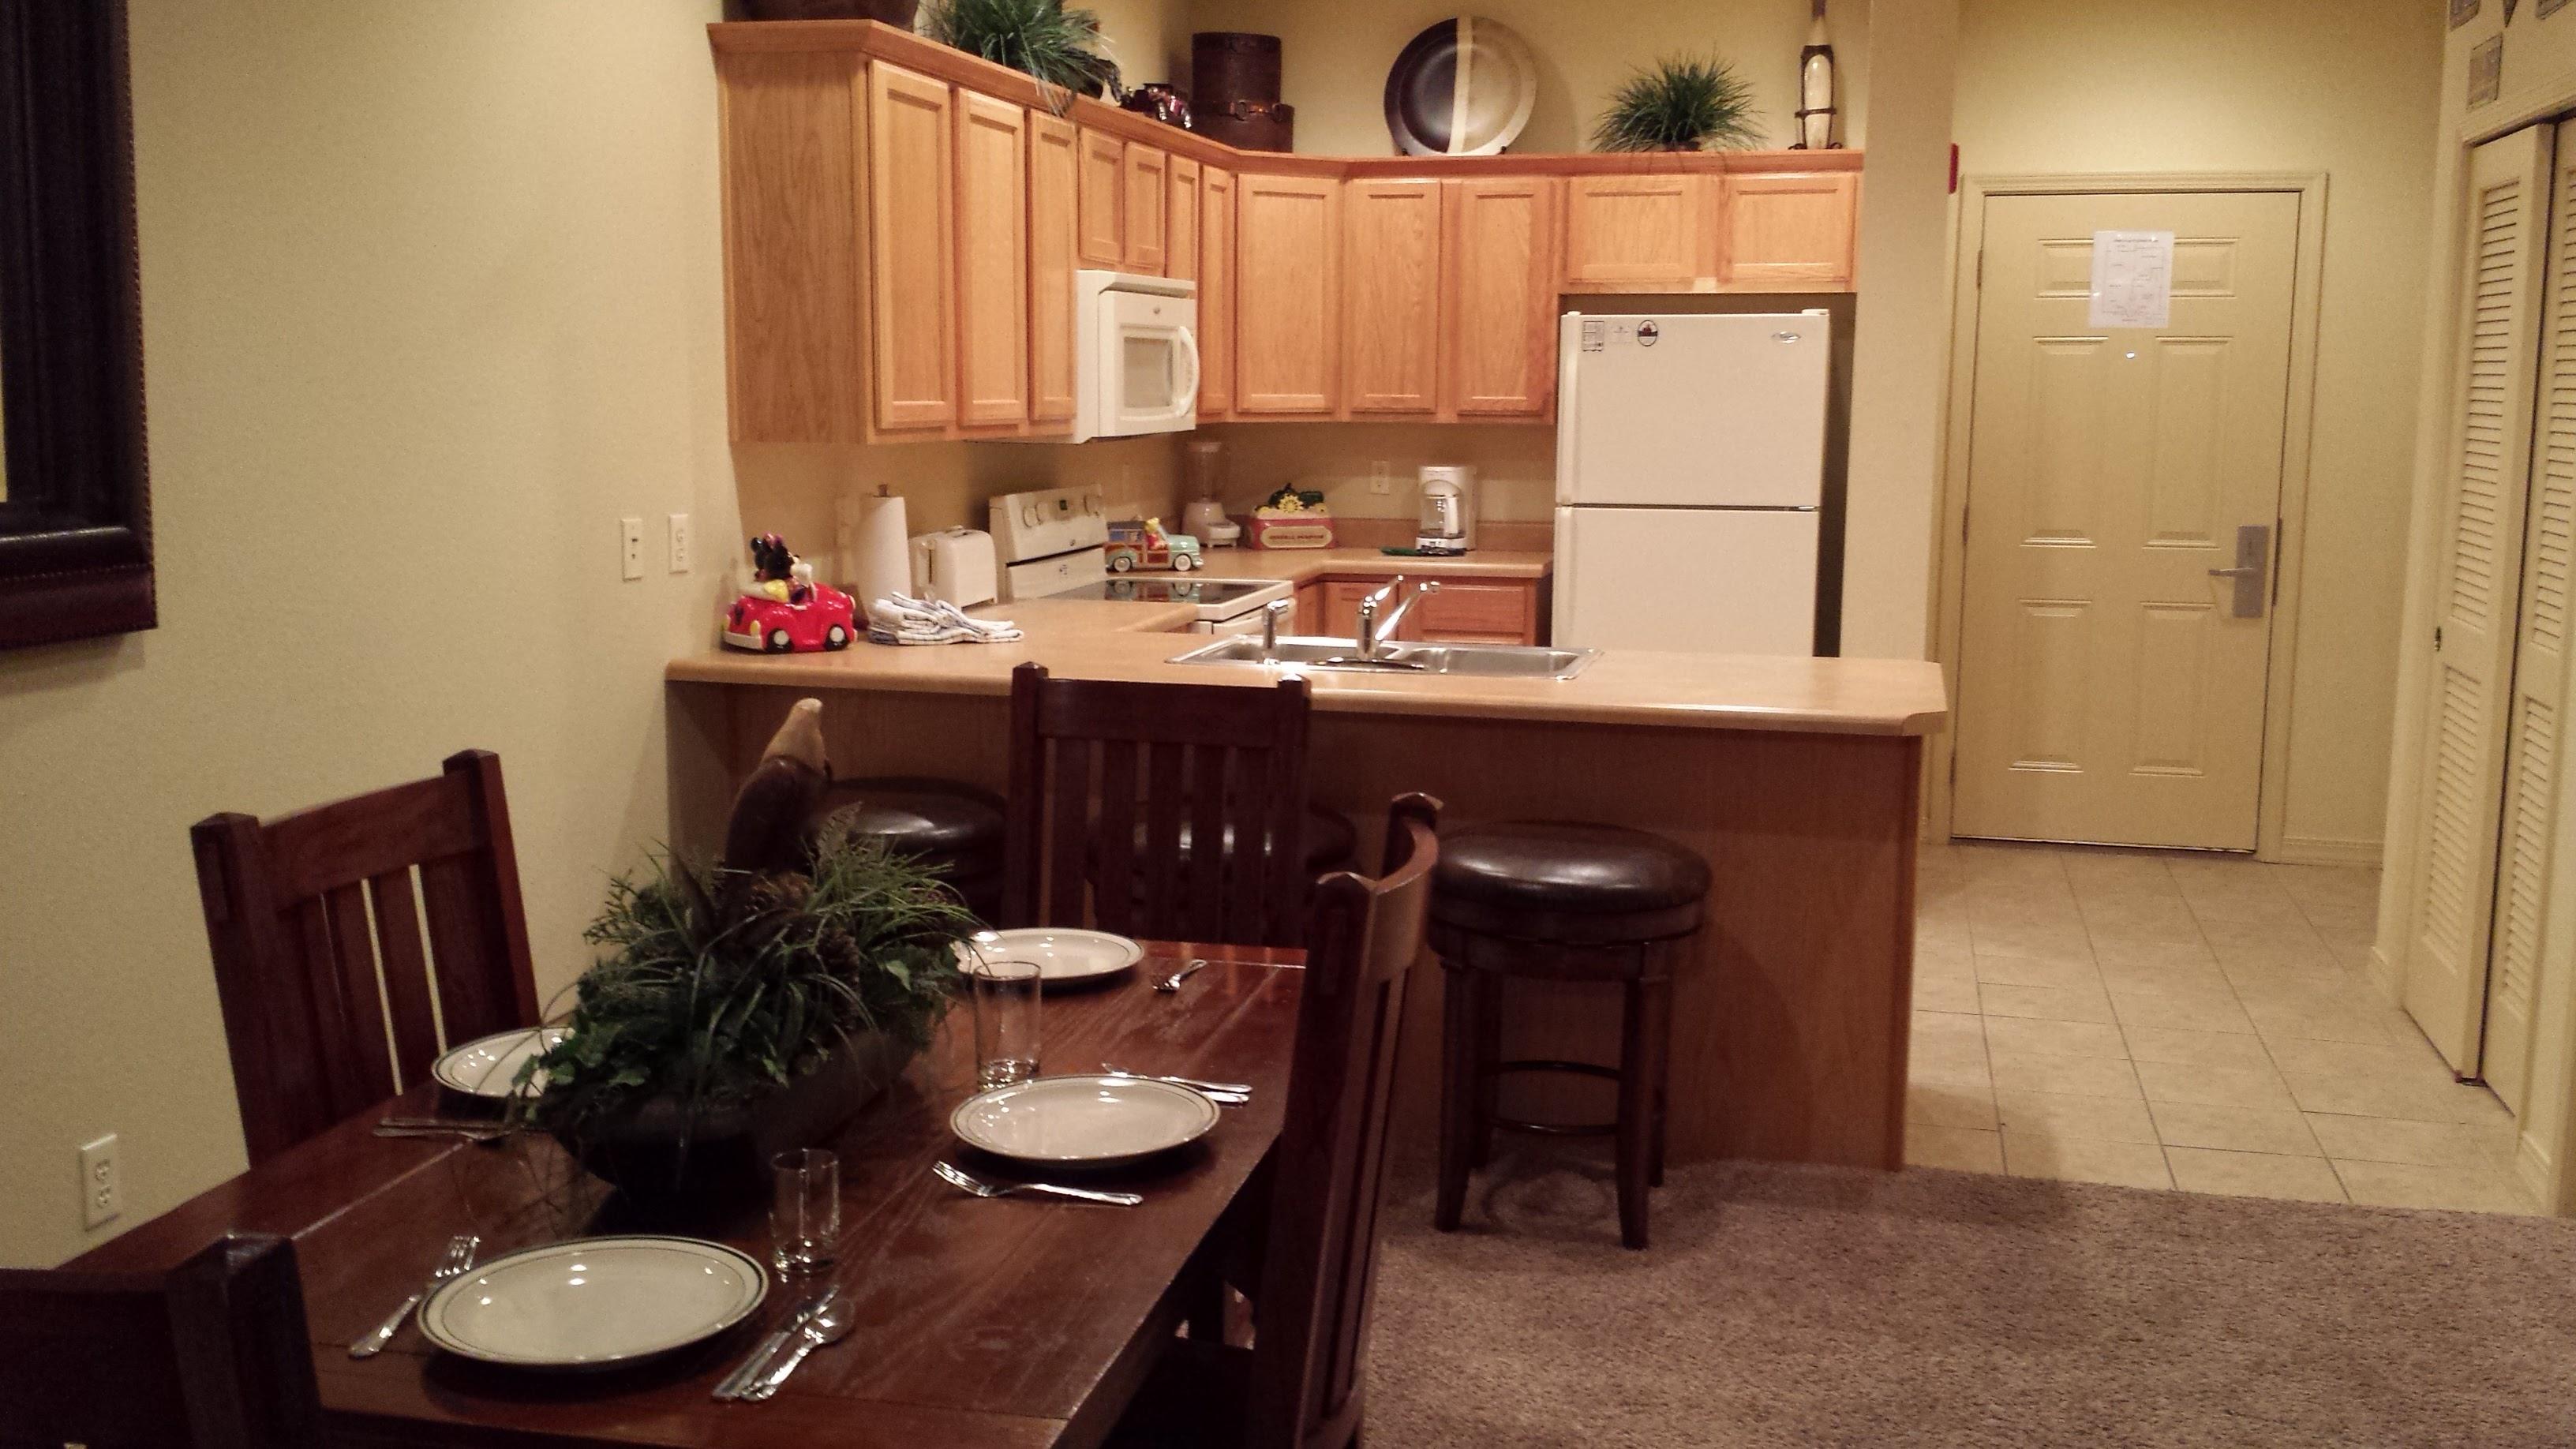 one bedroom condo.  One Bedroom Condos in Branson Missouri ThousandHills com